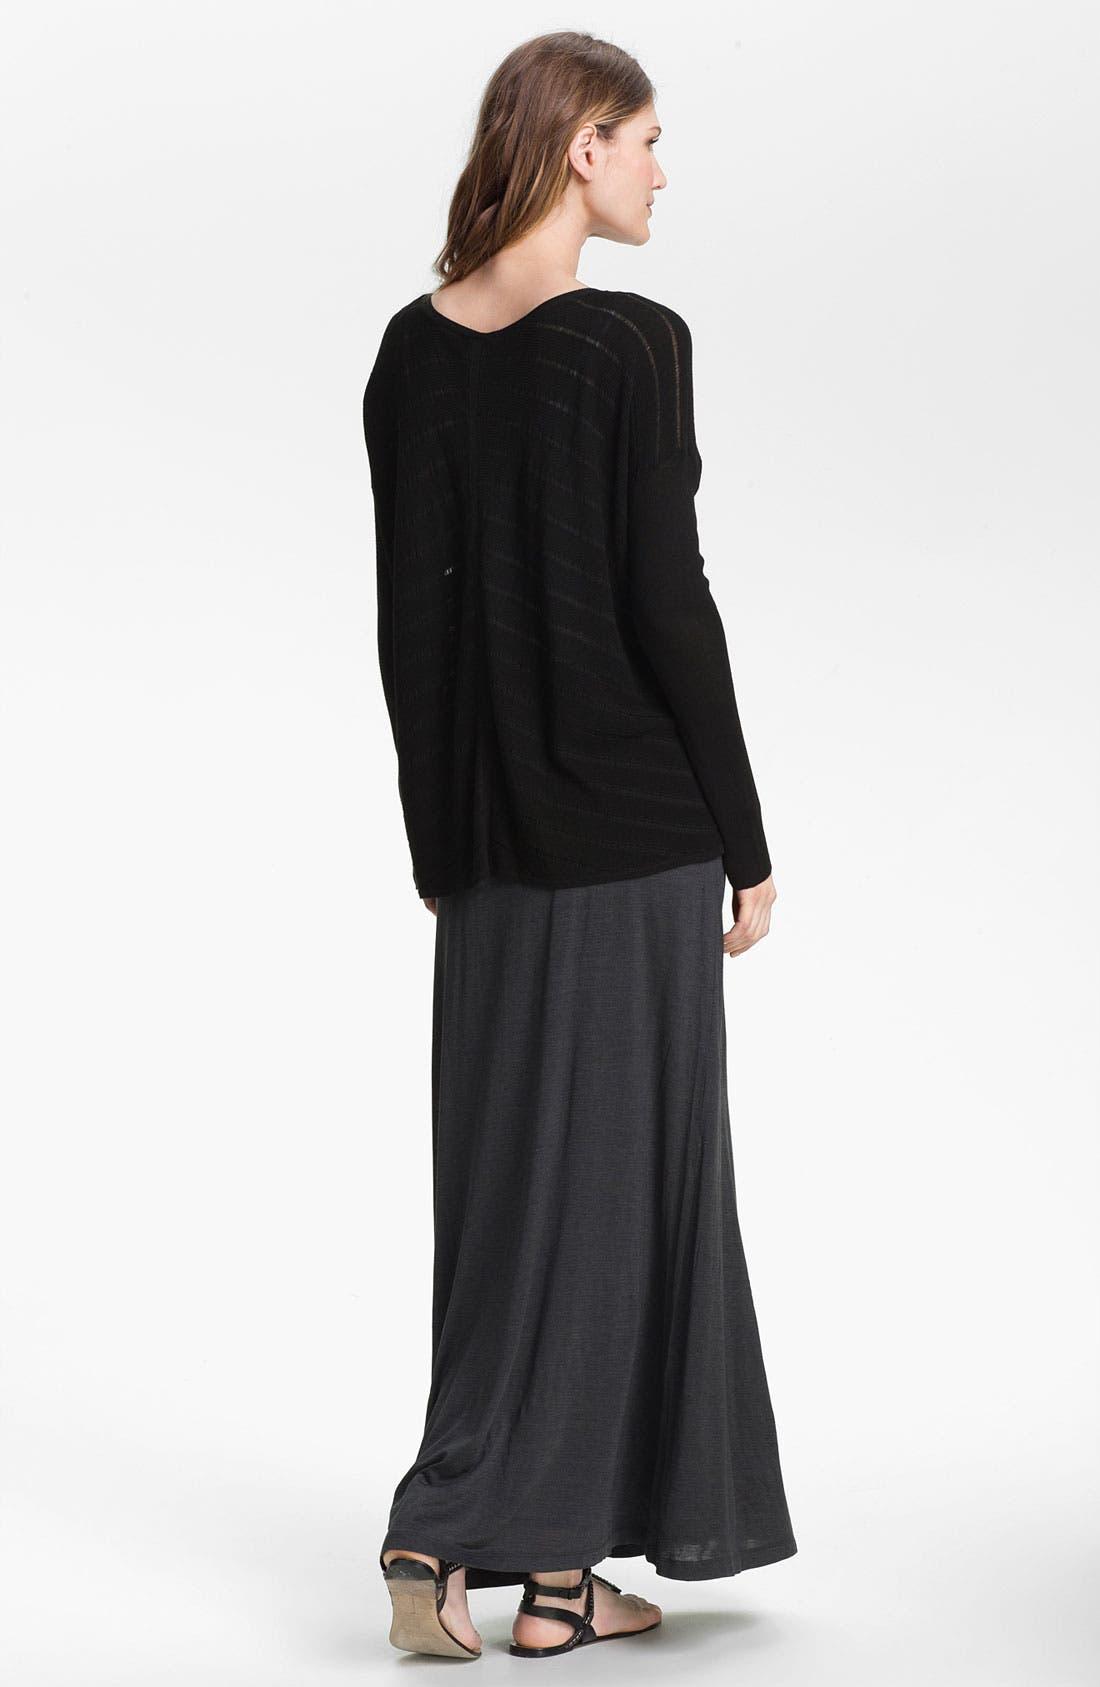 EILEEN FISHER,                             Silk & Cotton Jersey Maxi Skirt,                             Alternate thumbnail 2, color,                             025